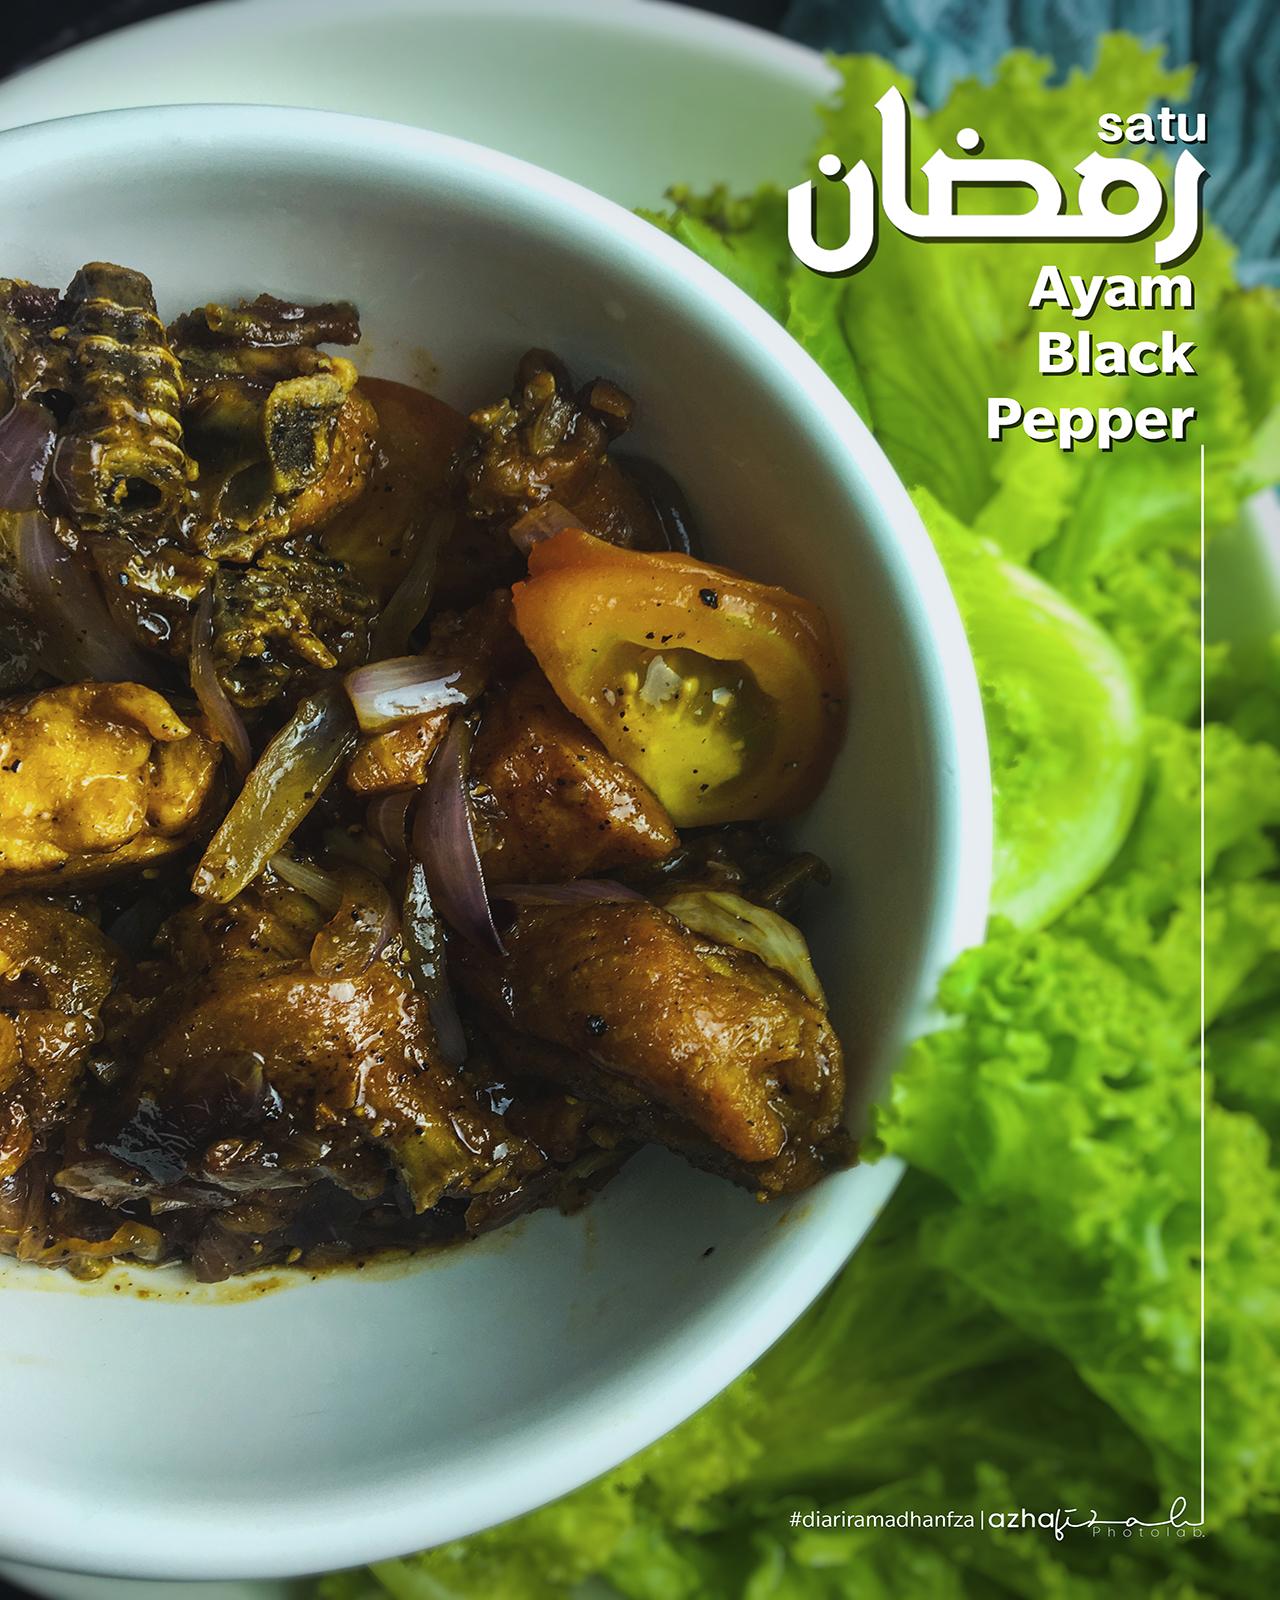 Resepi Ayam Black Pepper Mudah Masak Cara Fiza